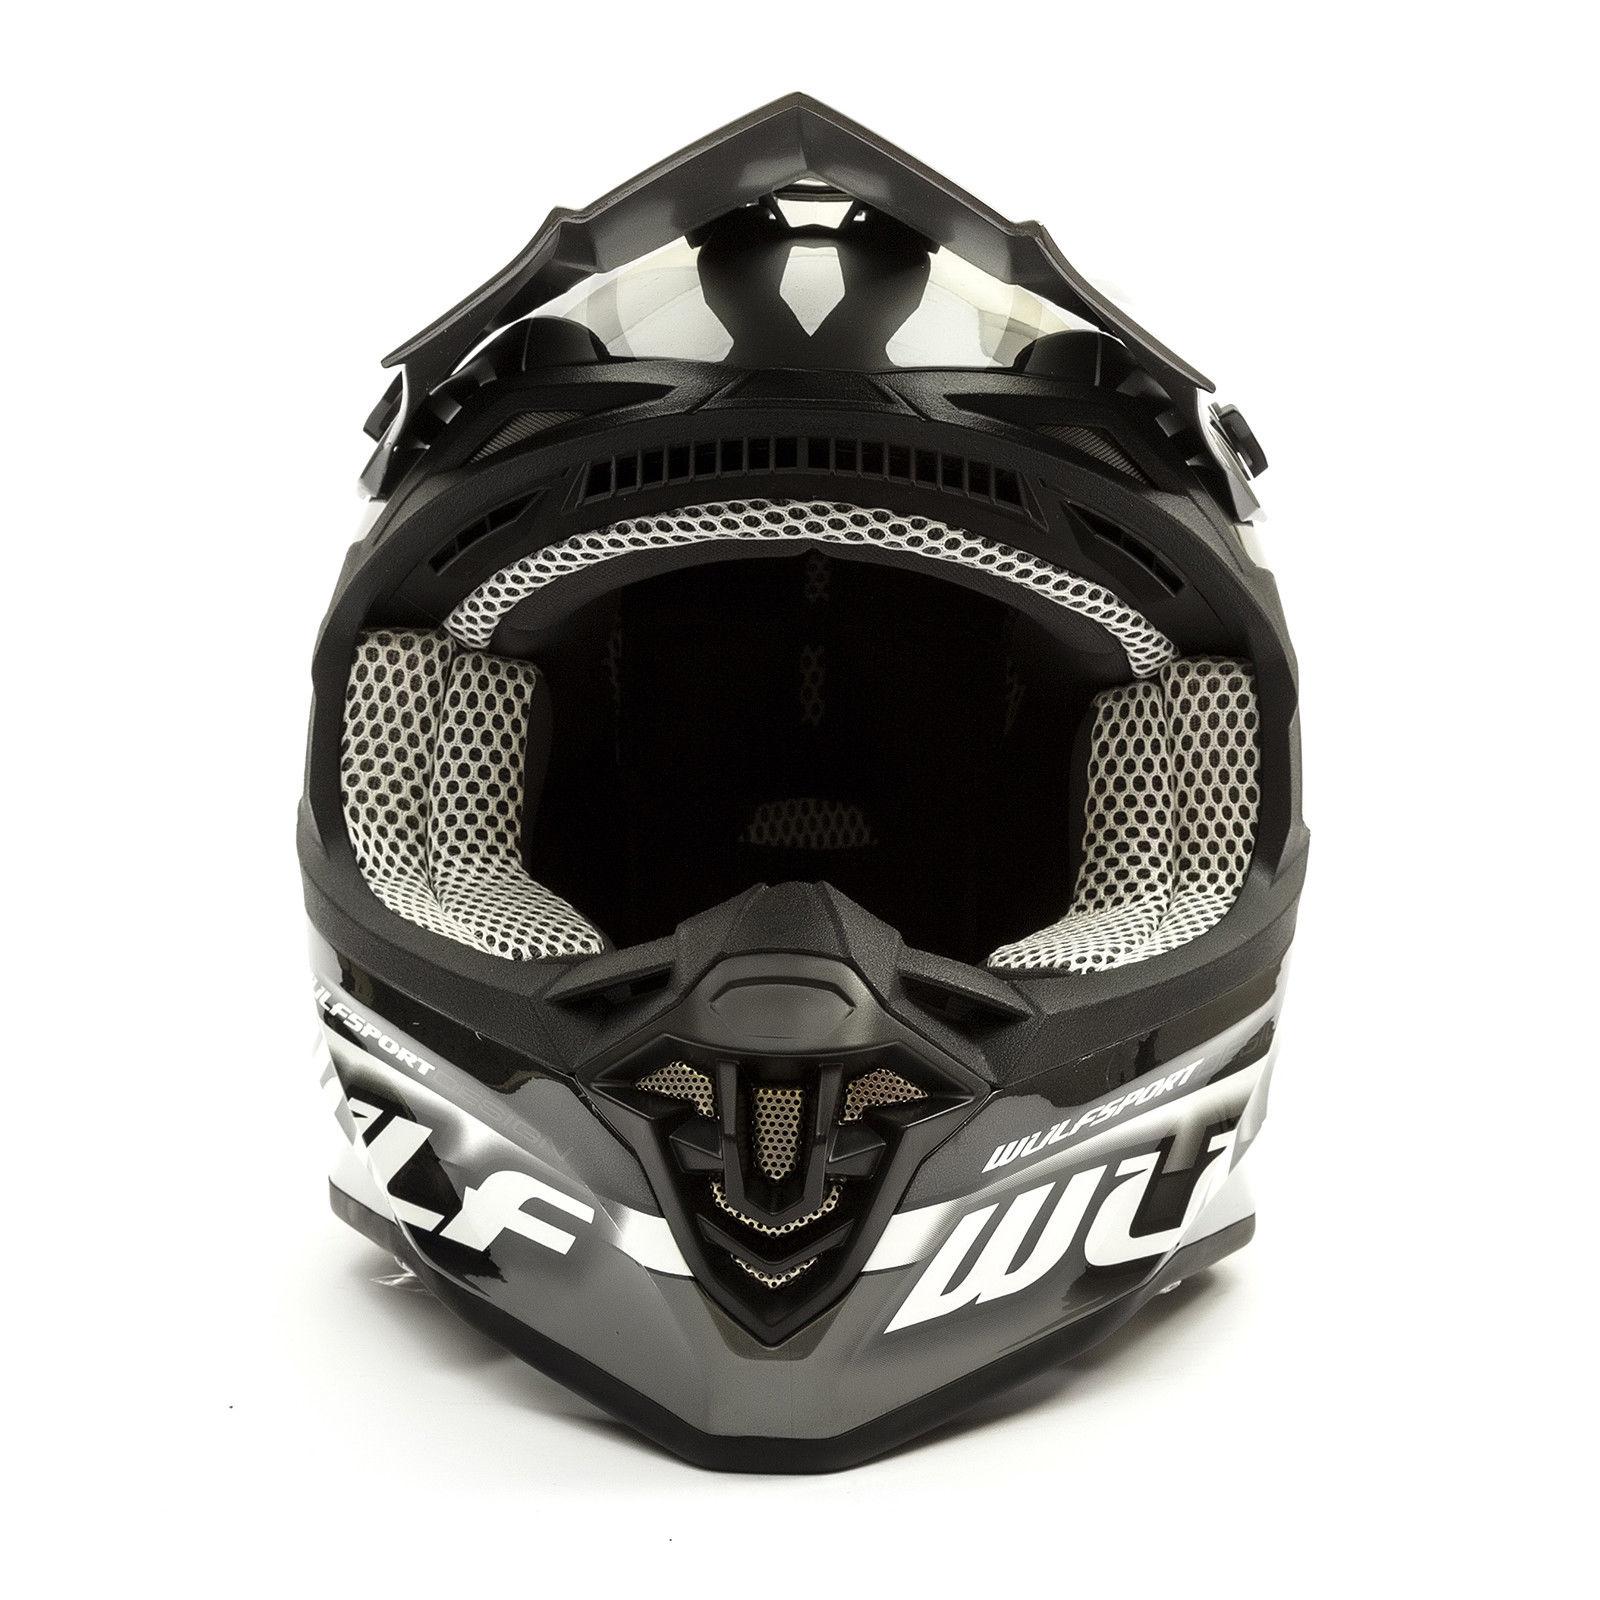 Wulfsport-Adult-Sceptre-Helmets-Motocross-Pitbike-Motorbike-Off-Road-Racing-ATV thumbnail 14